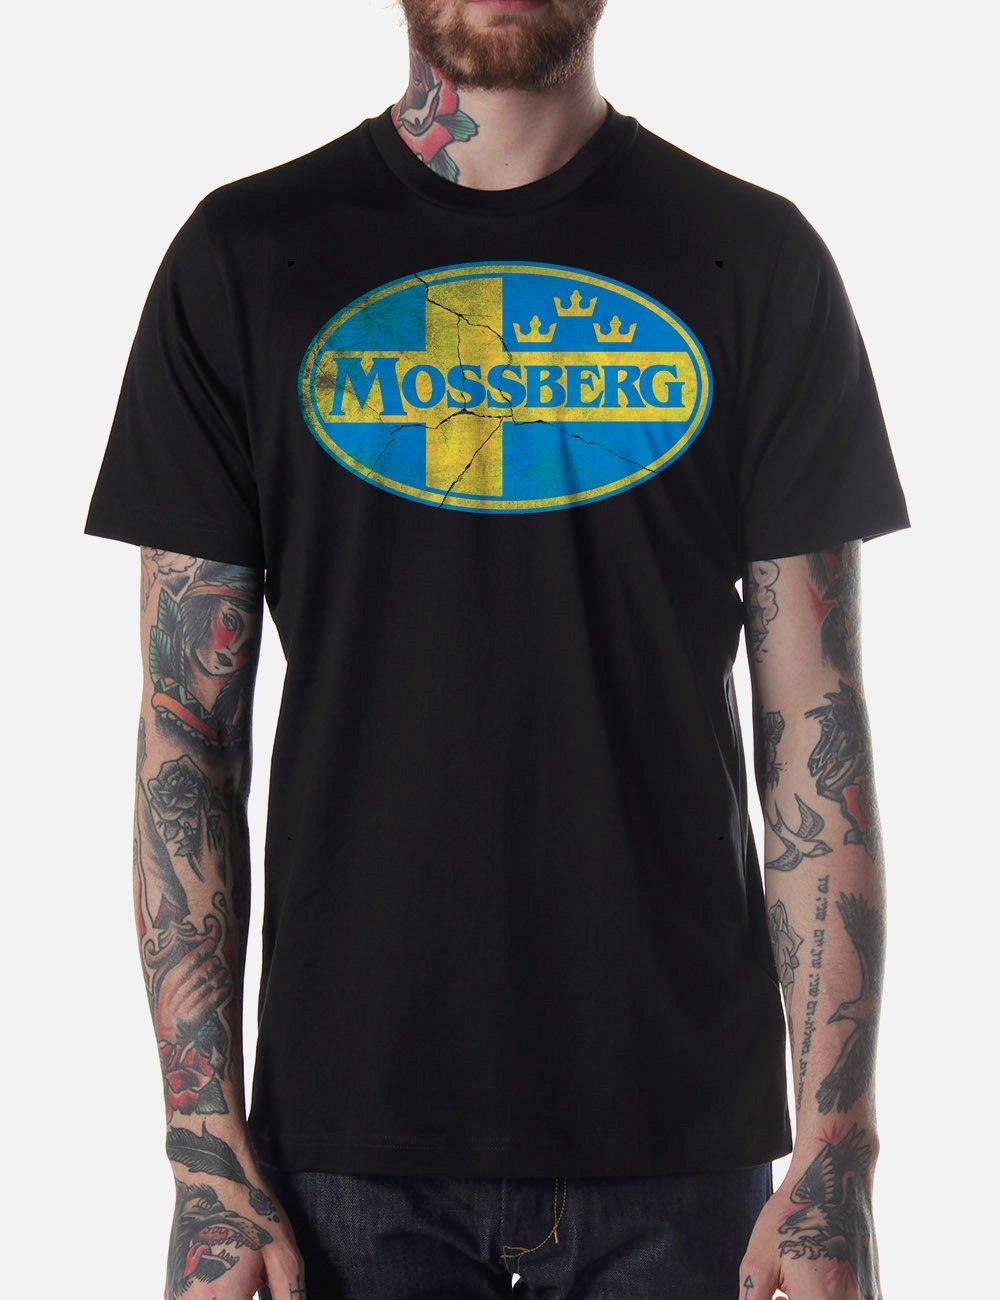 Black Men Tshirt MOSSBERG Black Tshirt For Men